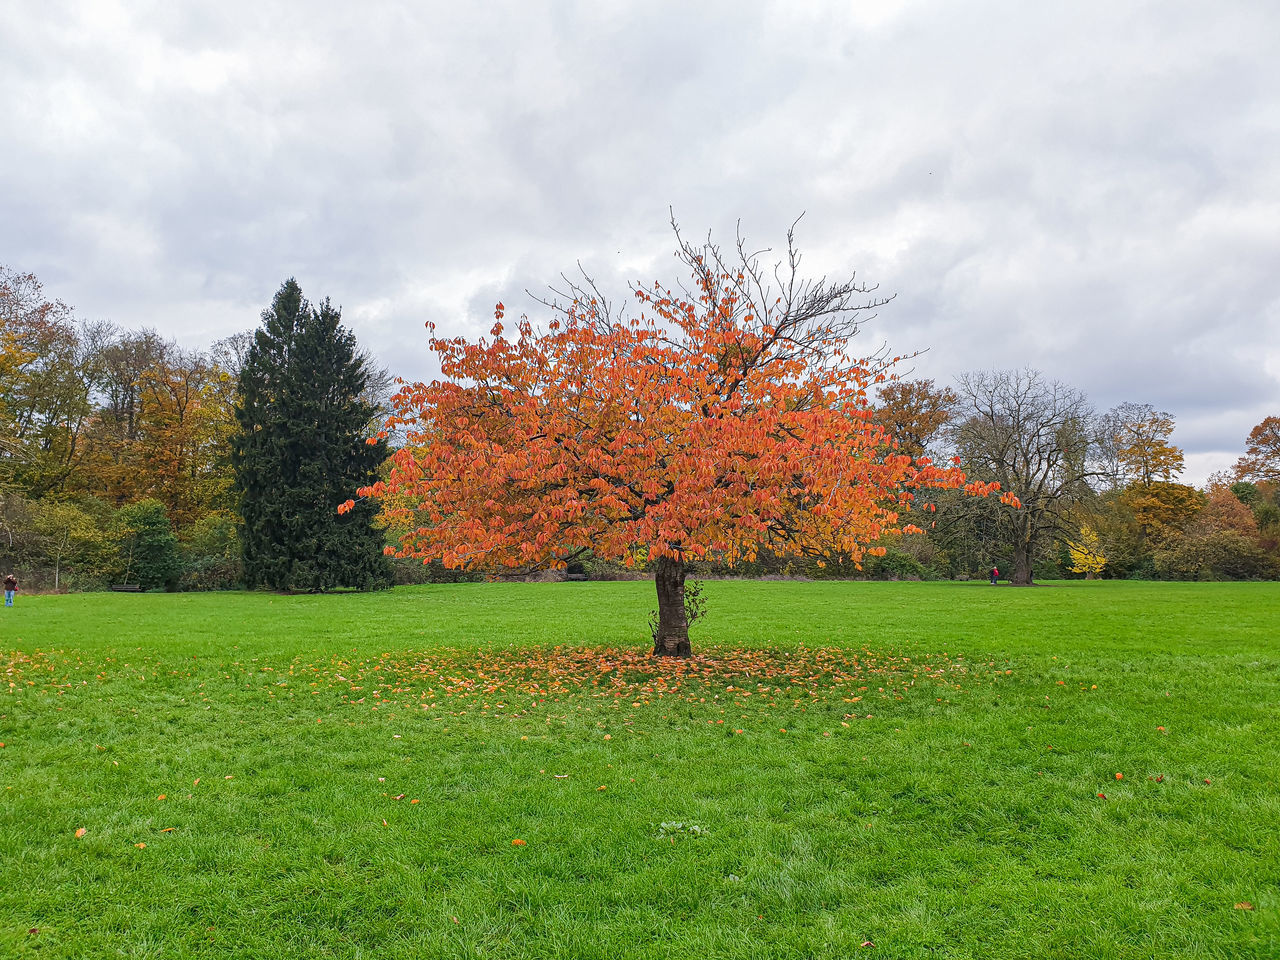 AUTUMN TREES ON FIELD AGAINST SKY